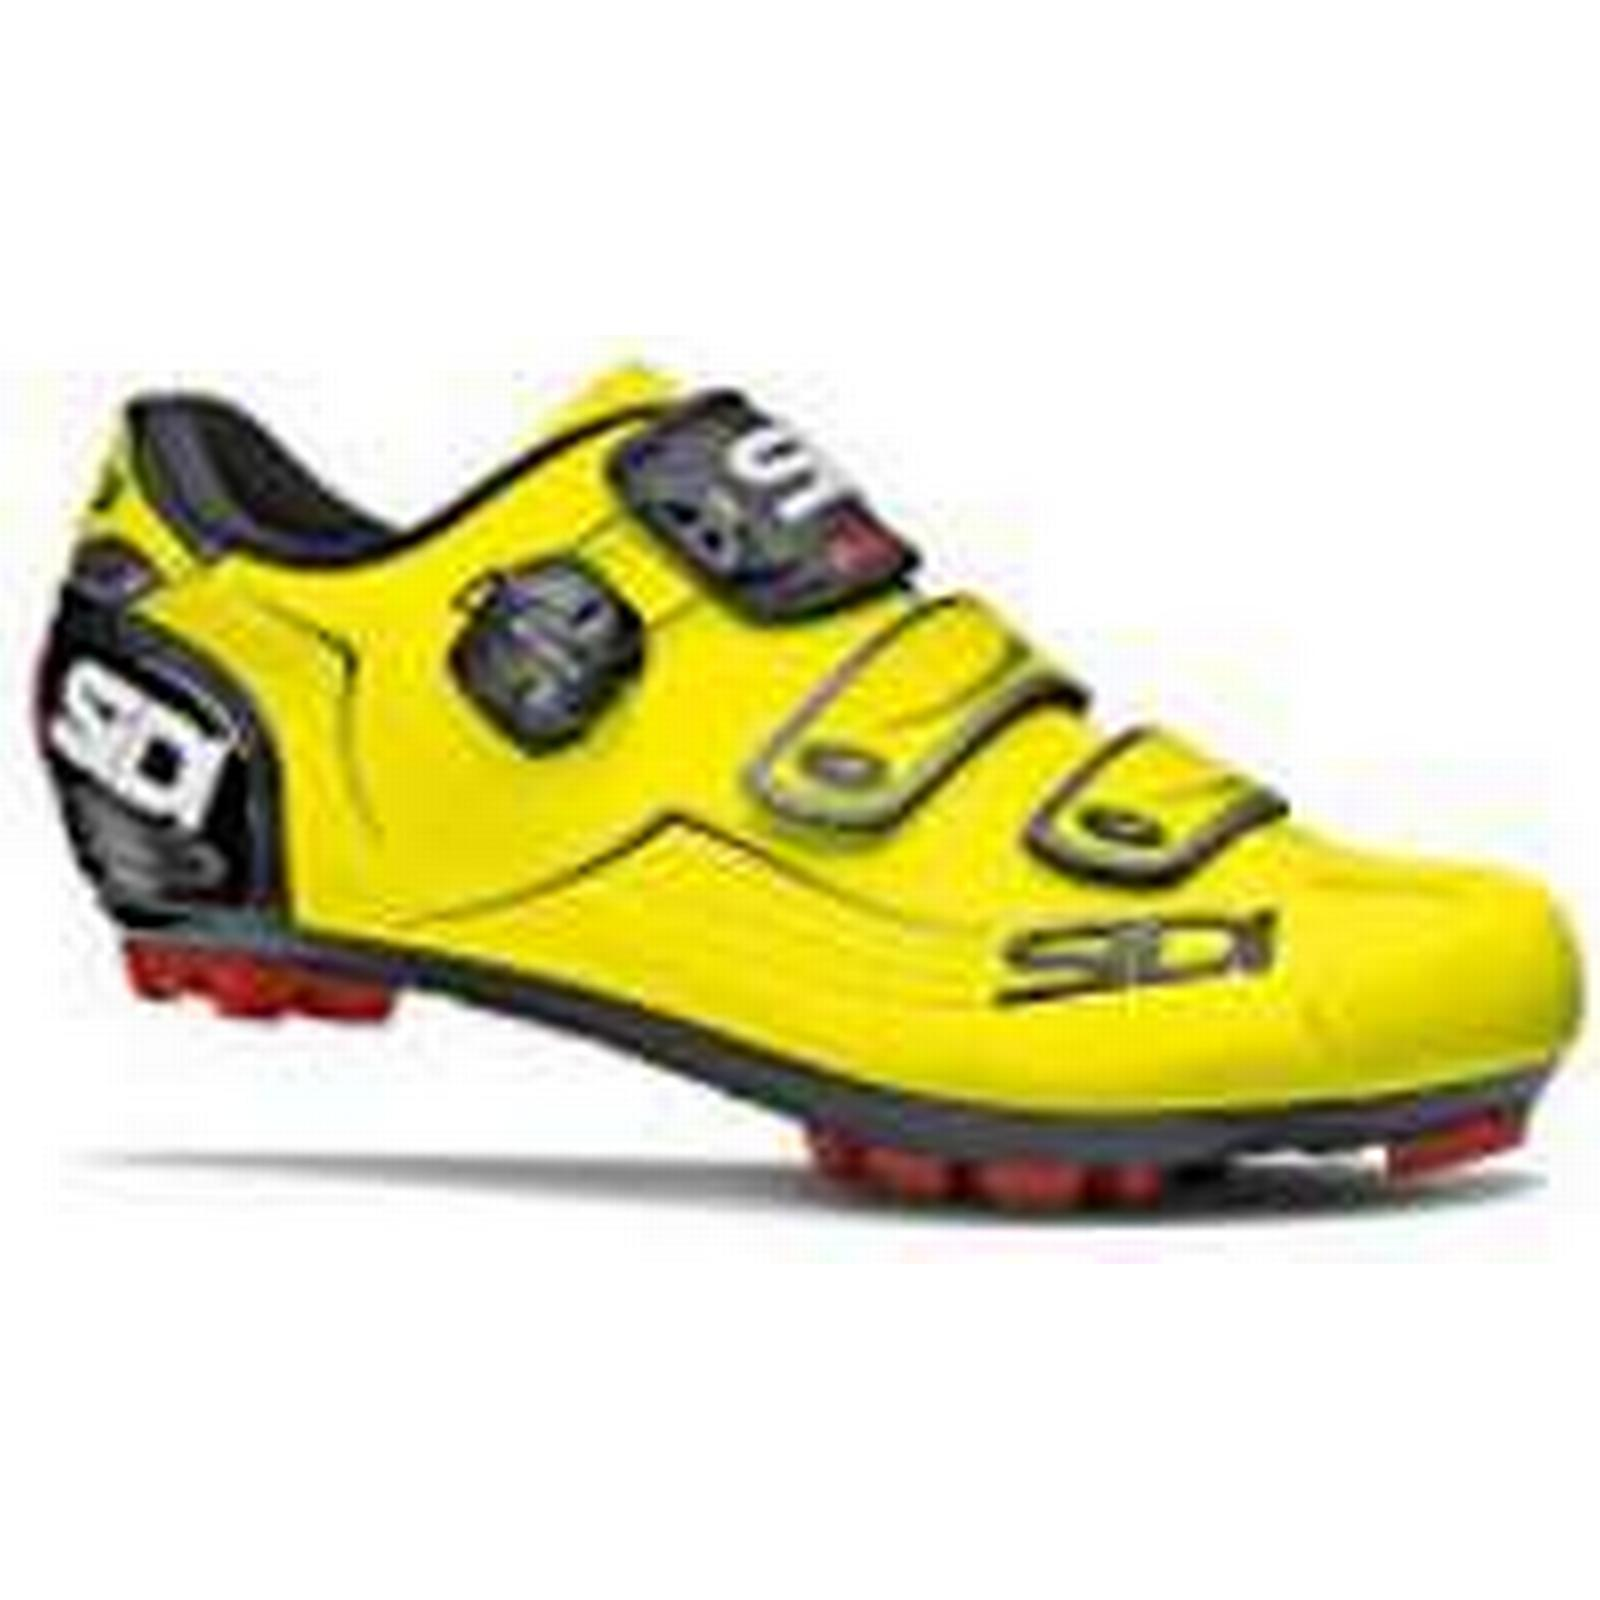 Sidi Trace MTB - Shoes - Yellow Fluo/Black - MTB EU 42 - Yellow Fluo/Black 0f8fcf